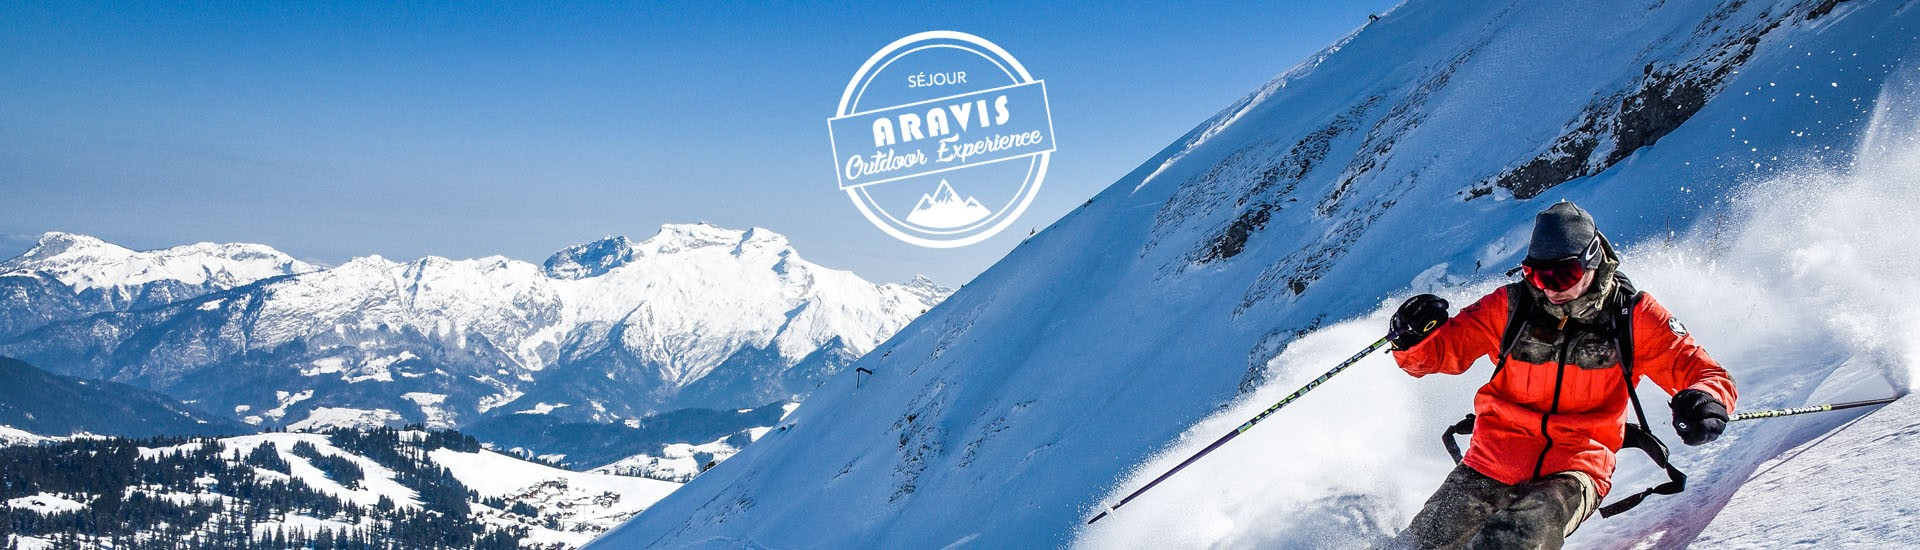 sejour-aravis-outdoor-experience-1539